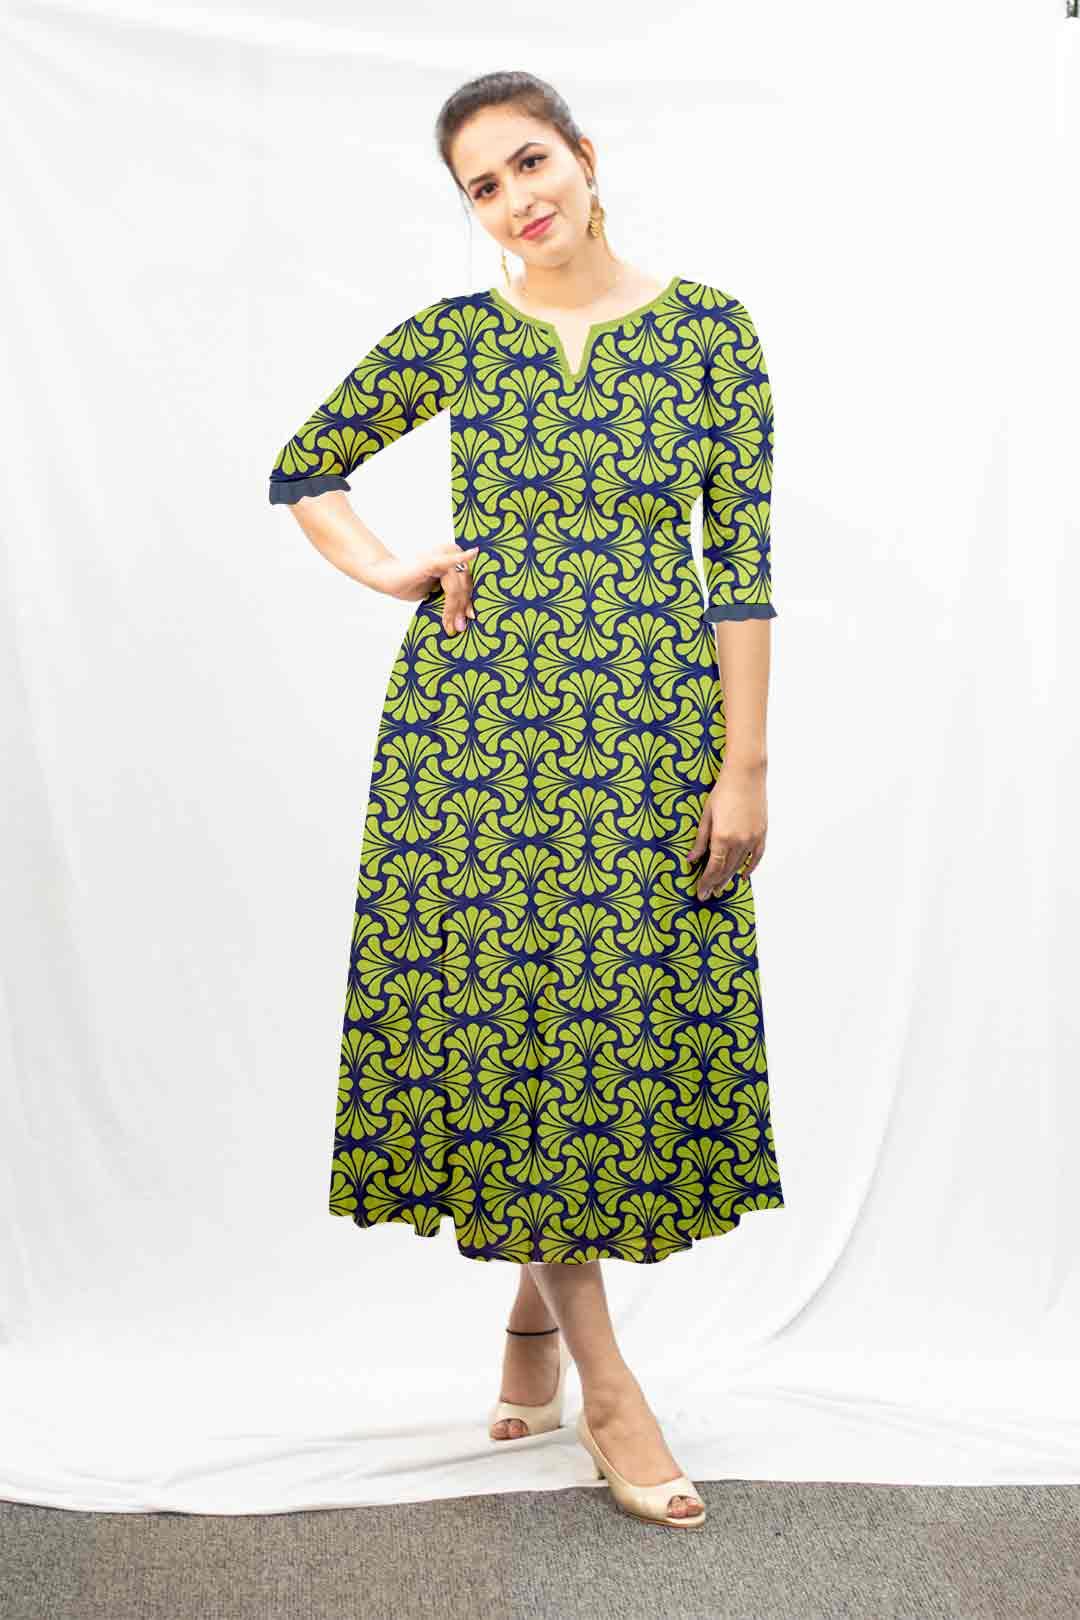 Georgette A line dress – Arrangement